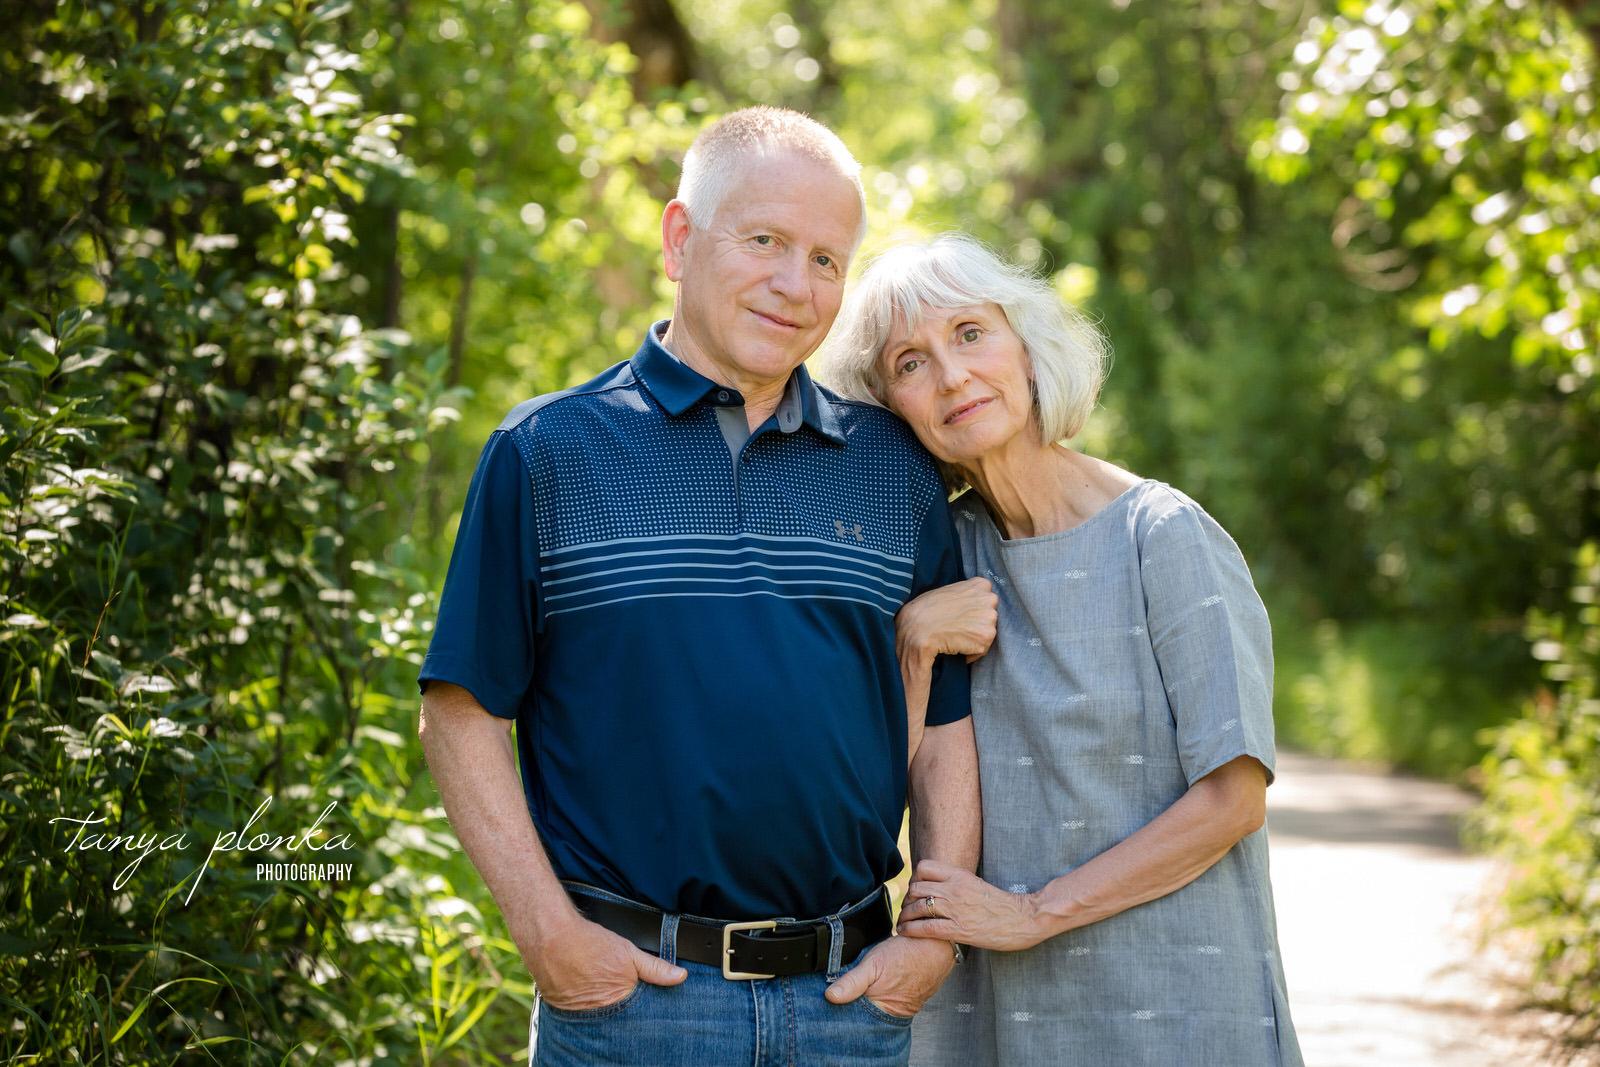 woman leans on her husband's shoulder